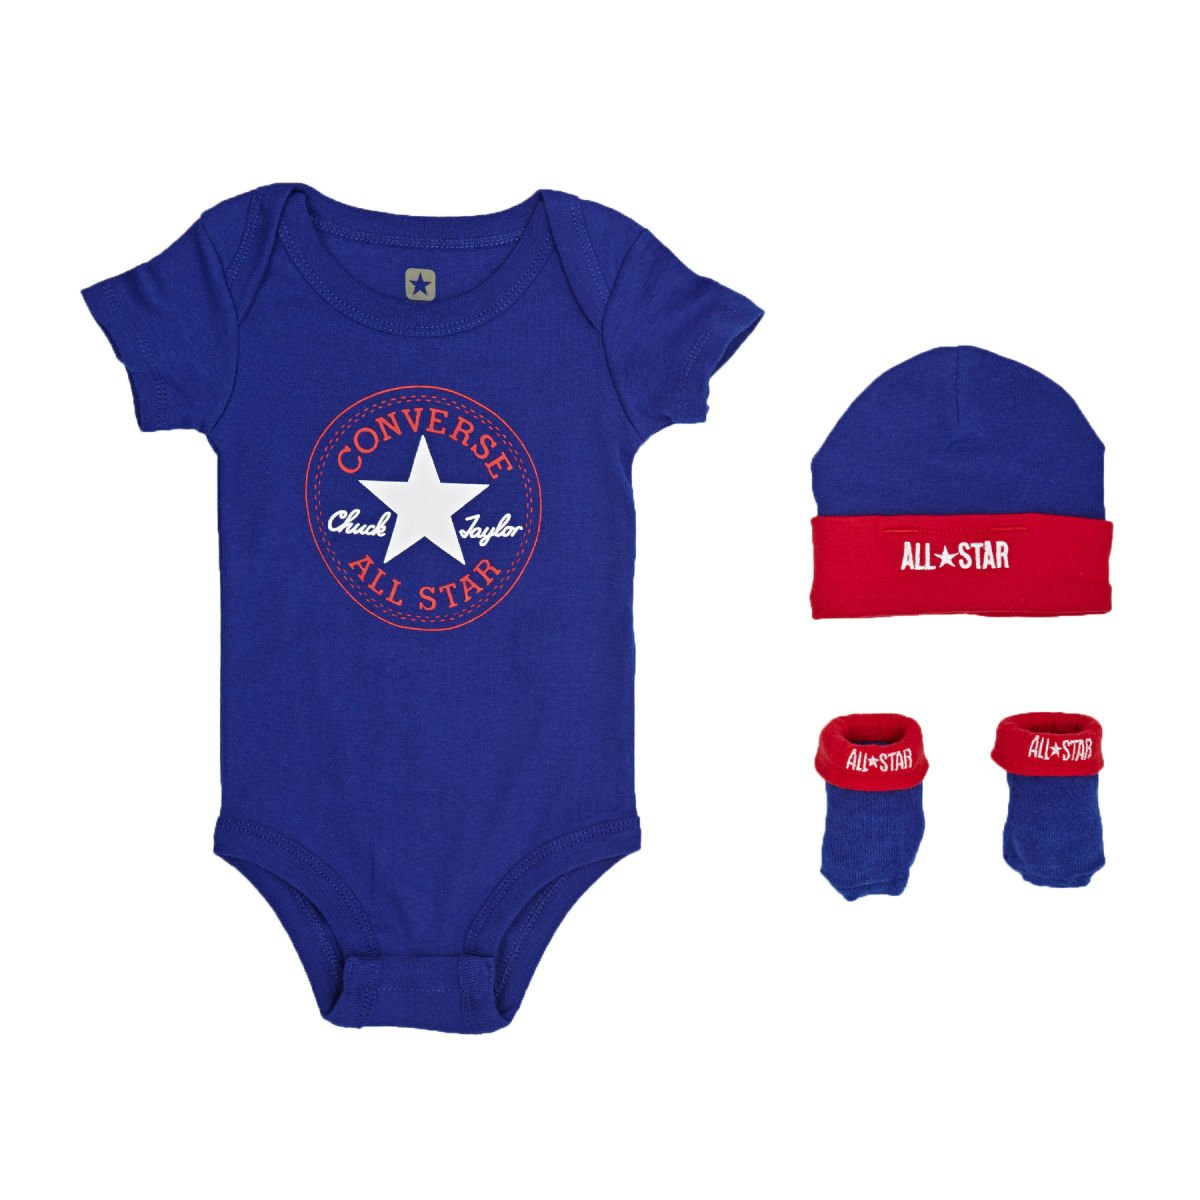 0-6 Monate Converse Babykleidung Set Erstausstattung Baby Geschenkset Body Strampler M/ütze Socken 3er Gift Set Blau Gr